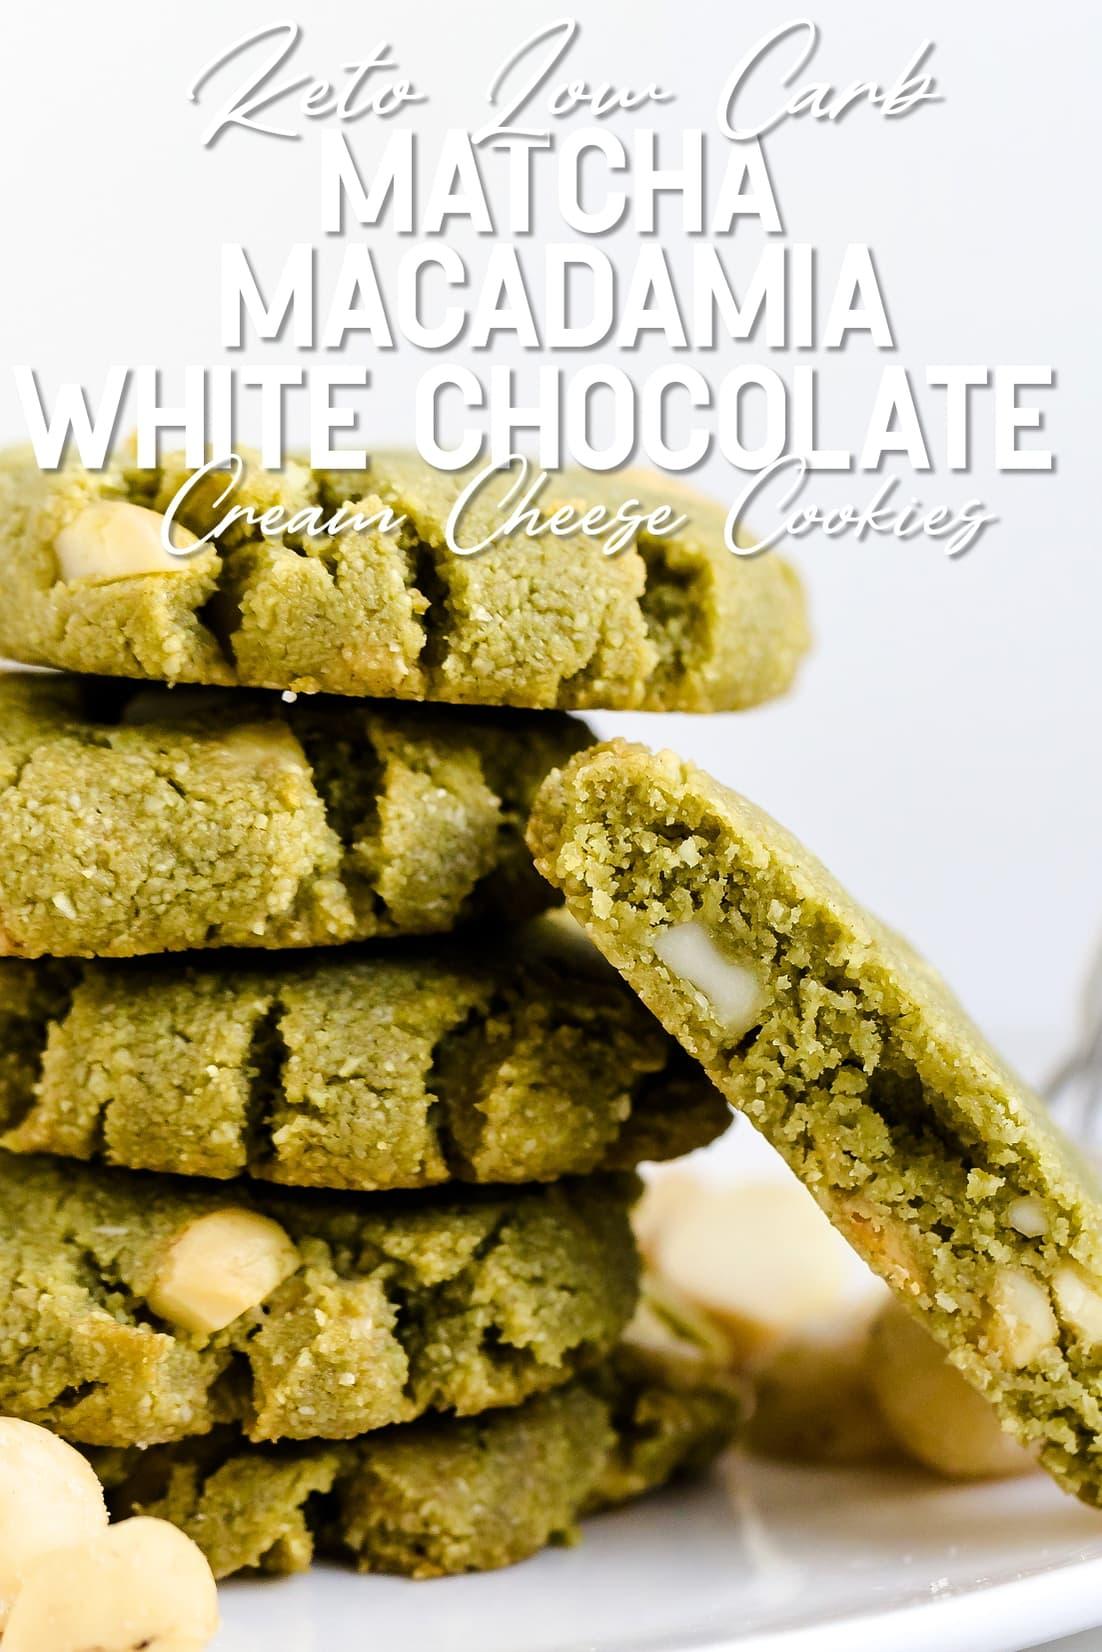 Matcha Cream Cheese Macadamia White Chocolate Chip Cookies stacked together